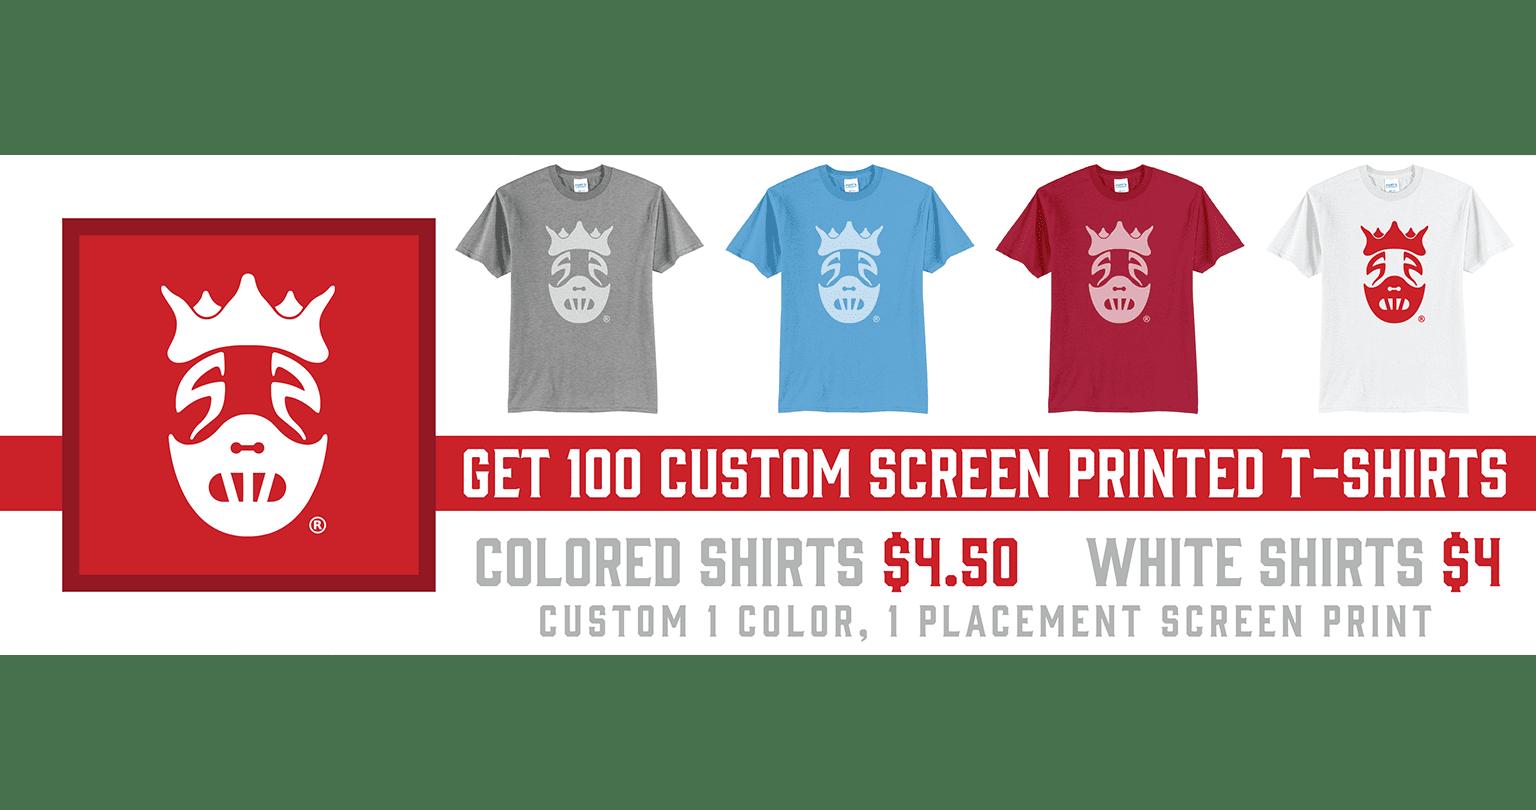 100 Shirt Special - December 1